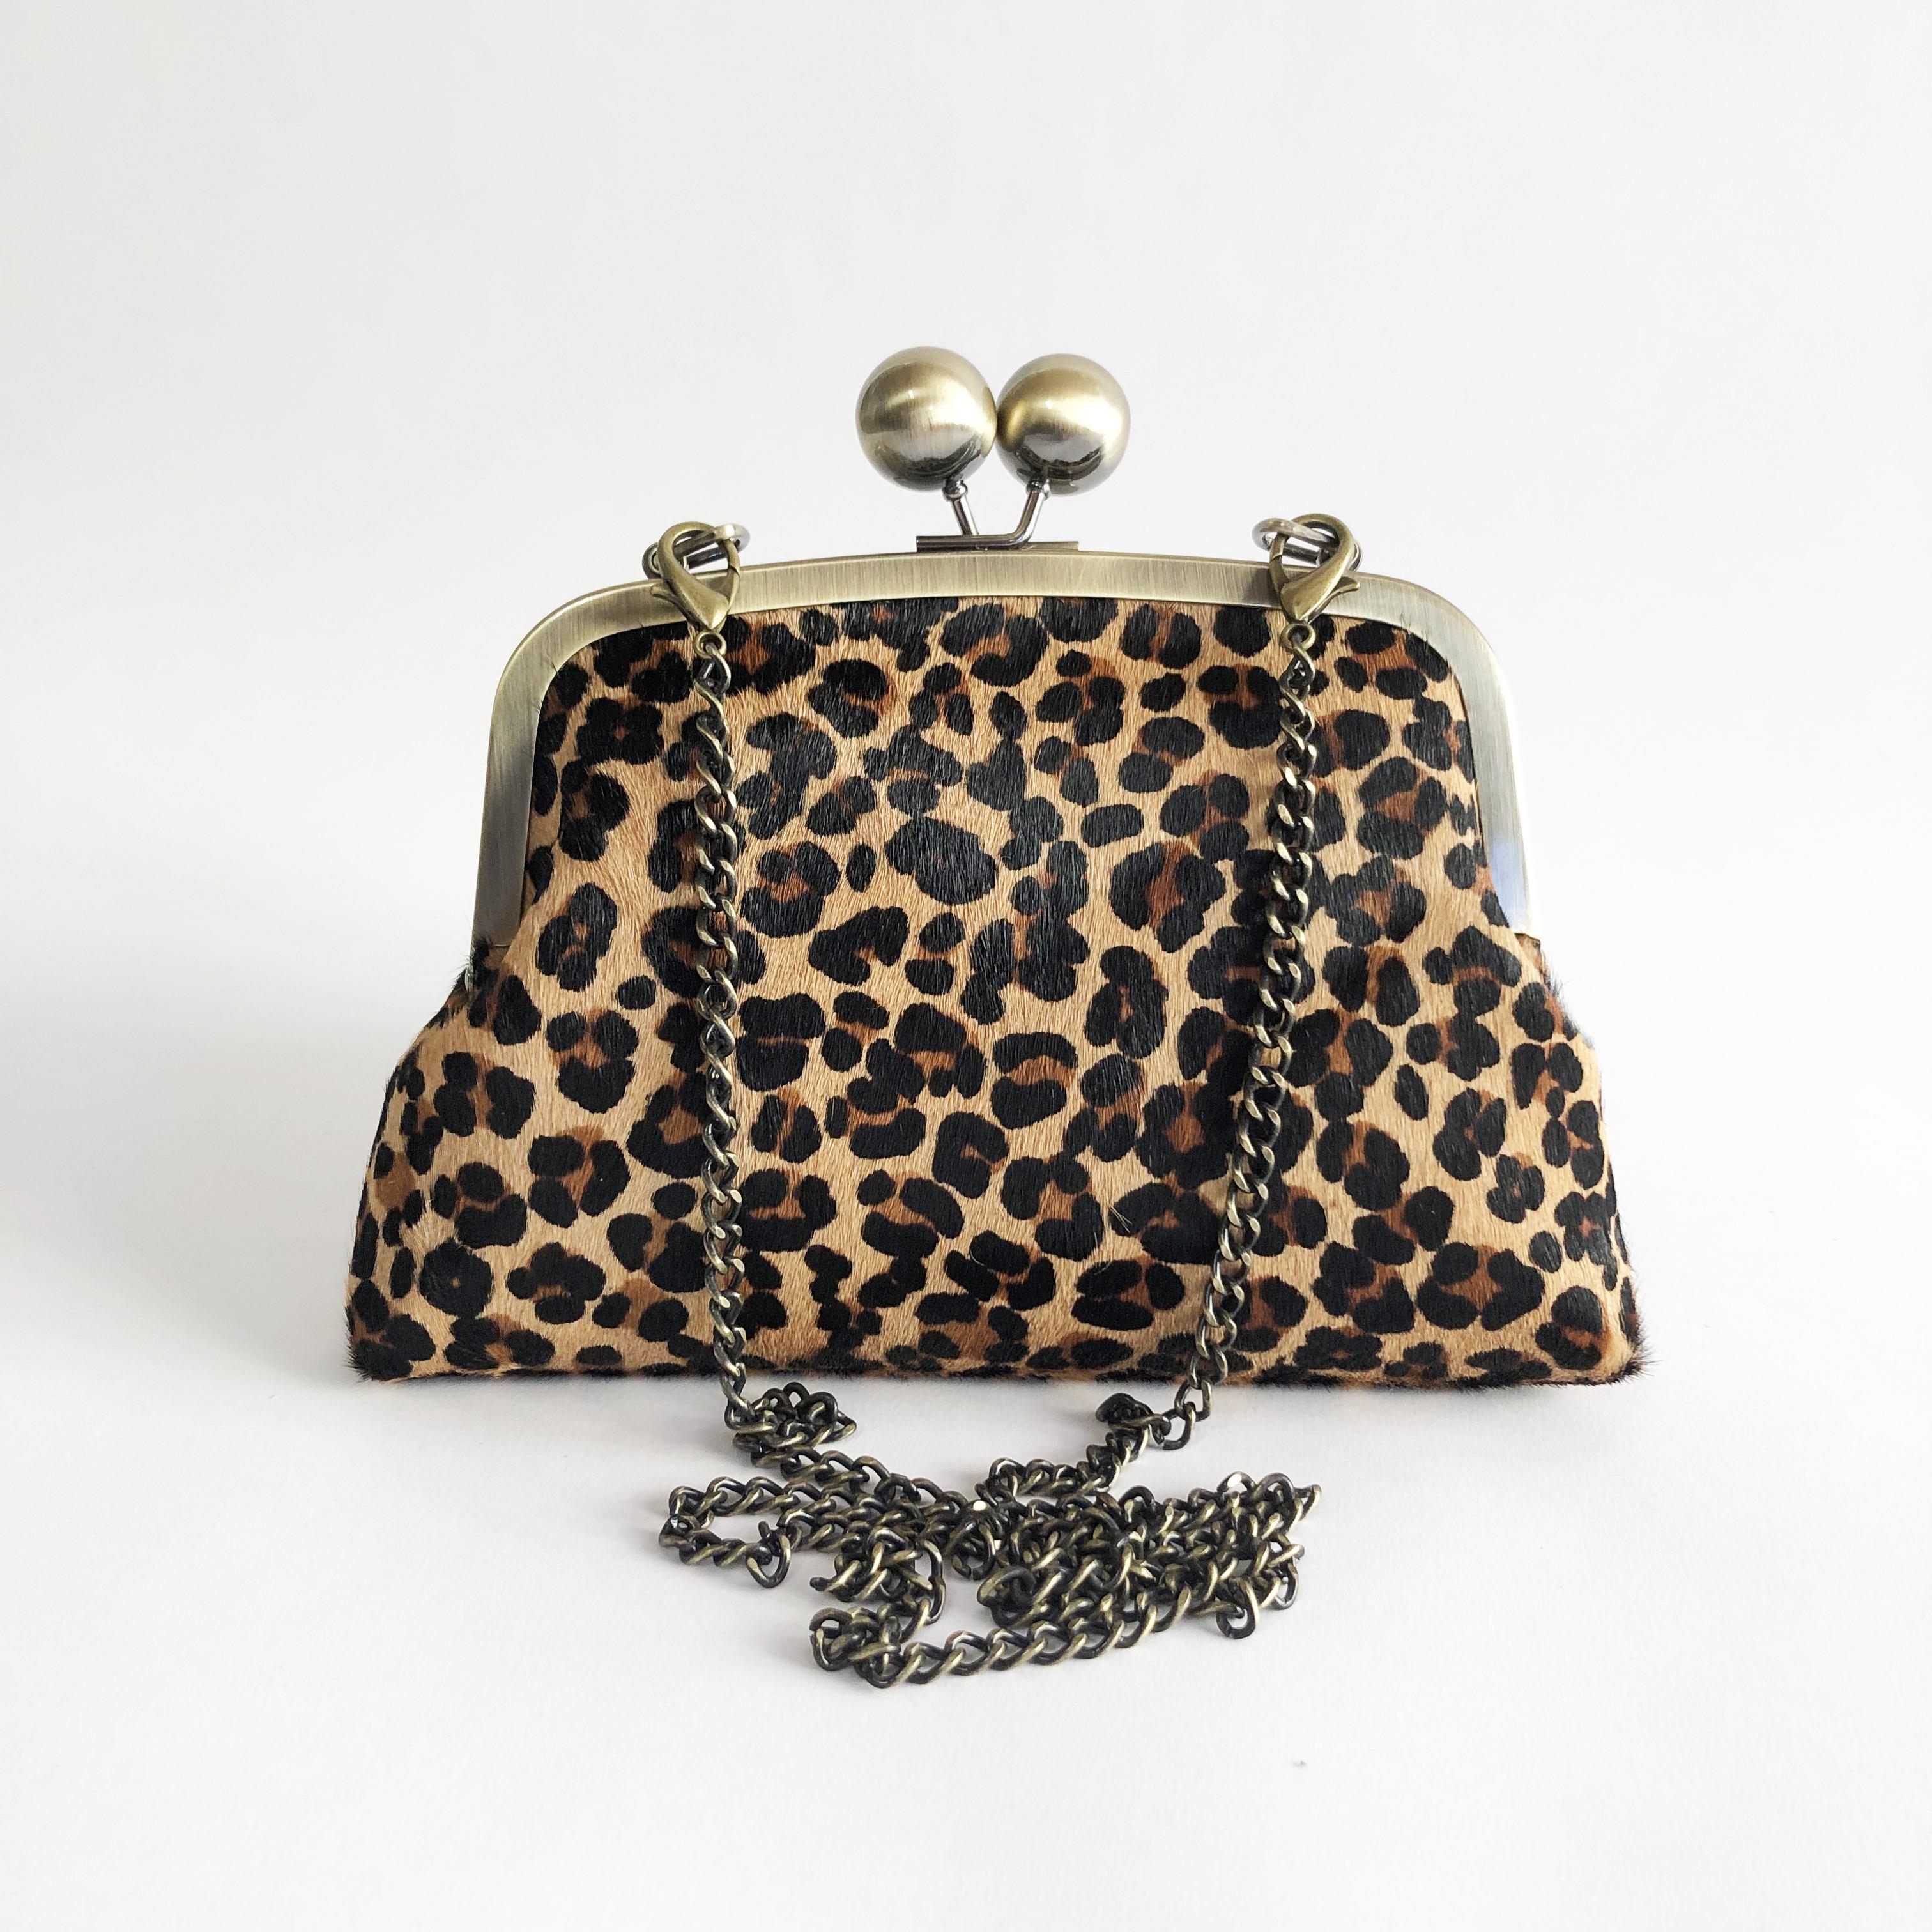 fac1d44a9 Leopard print handbag / animal print clutch purse with strap